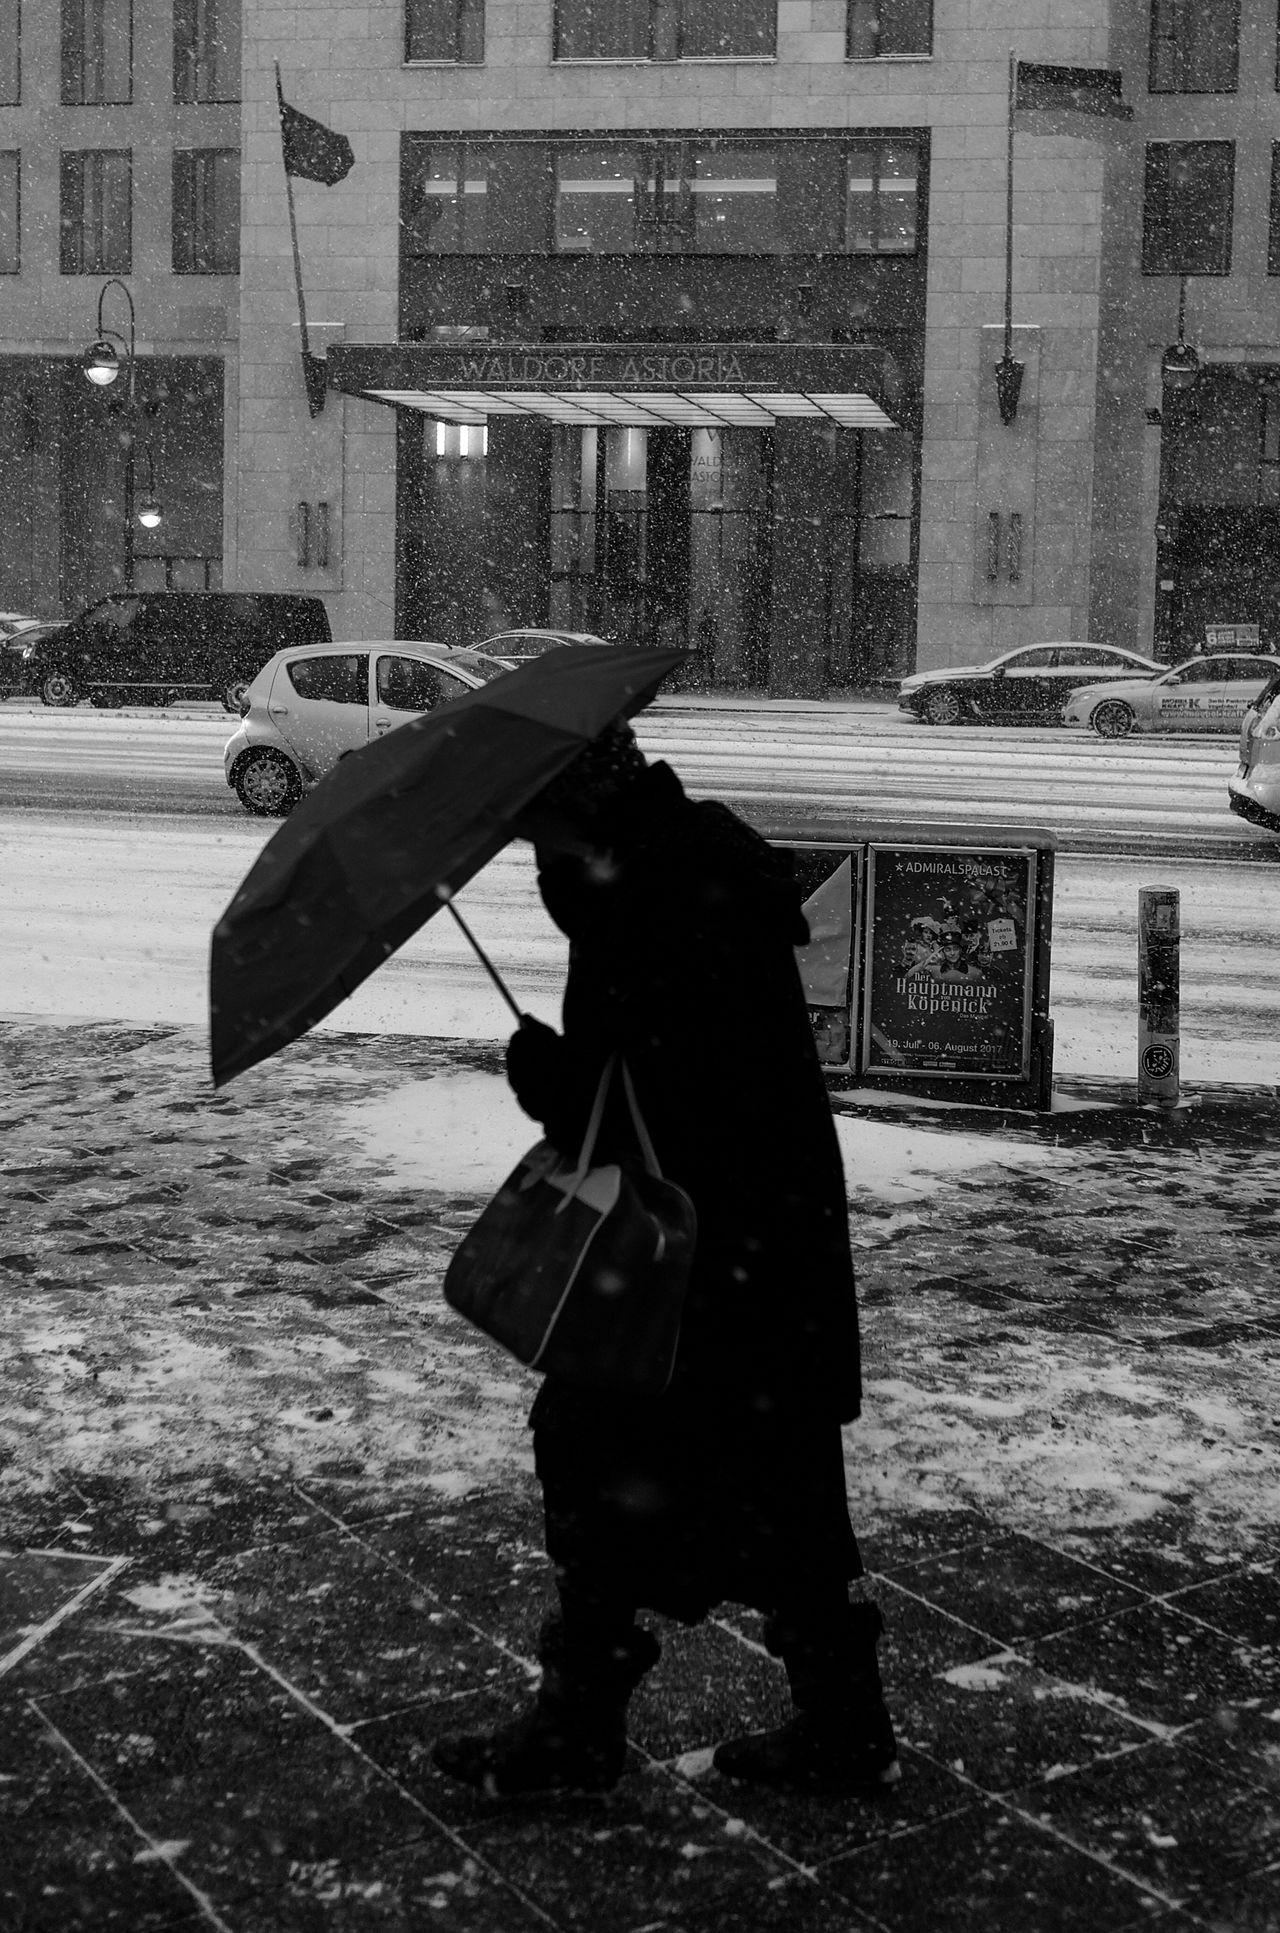 One Person Real People Built Structure Architecture Waldorf Astoria Berlin Berliner Ansichten Winter Snow Snow ❄ Blizzard Snow Storm